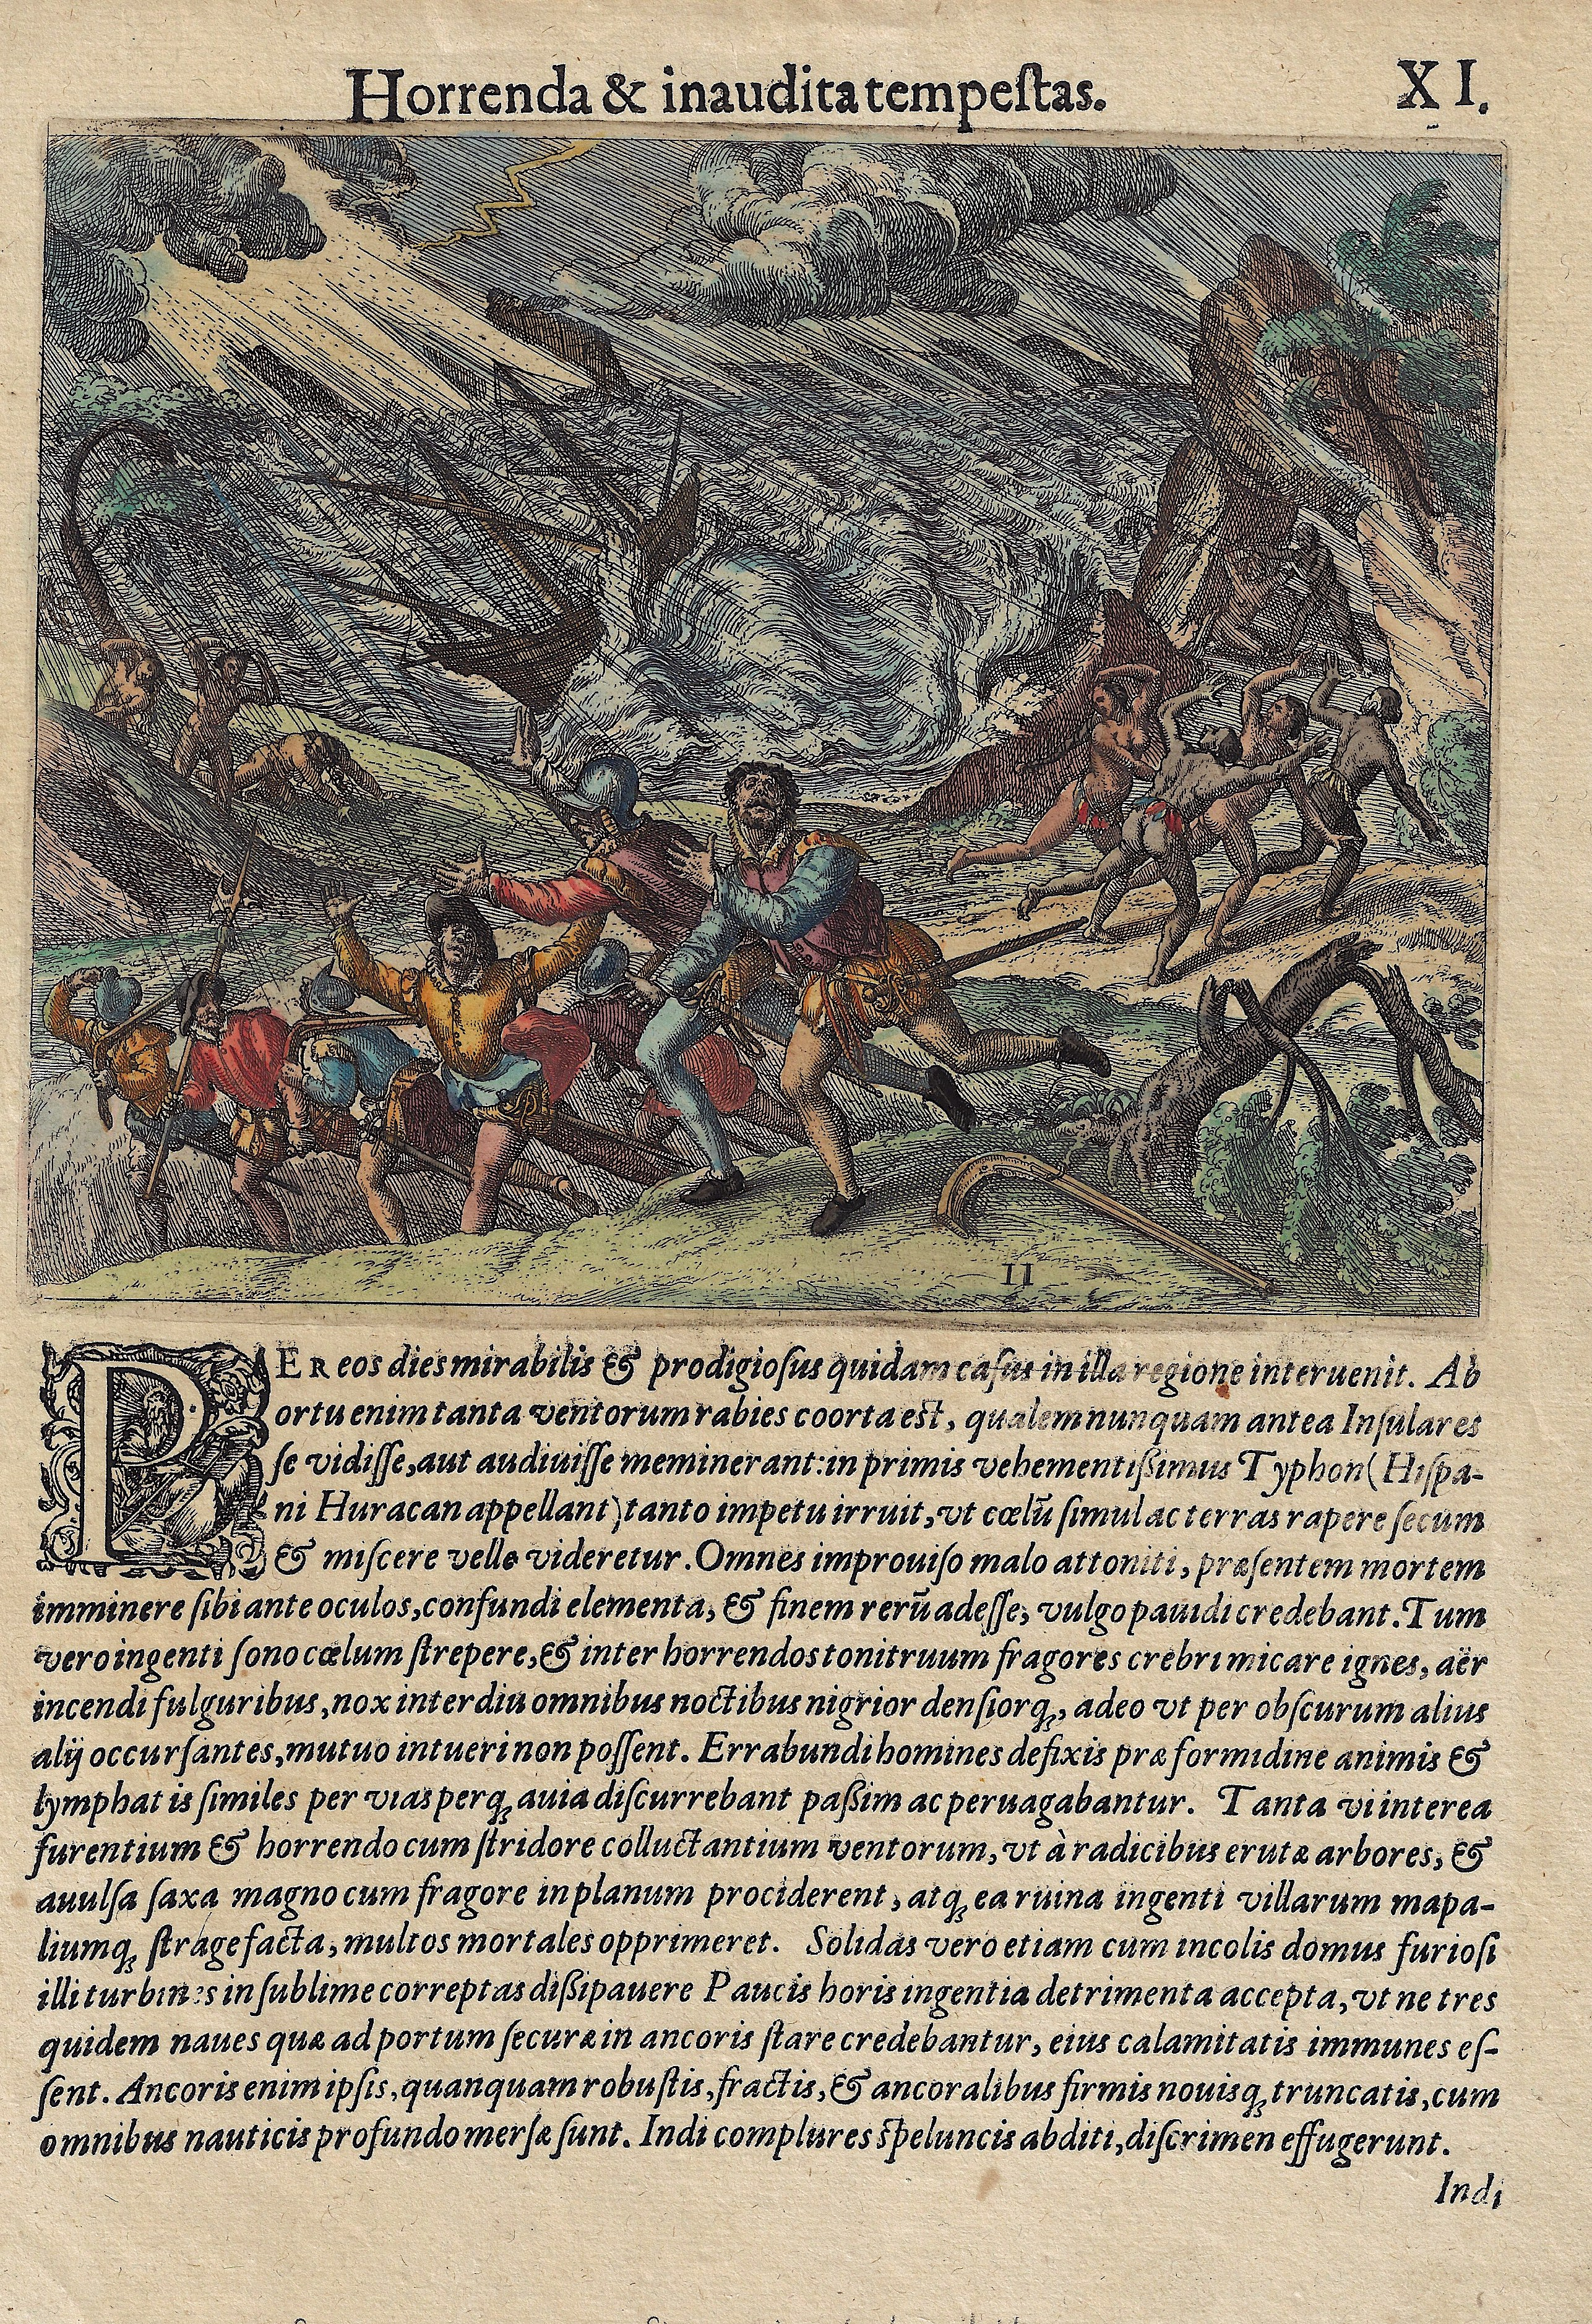 Bry, de Theodor, Dietrich Horrenda & inaudita tempestas.